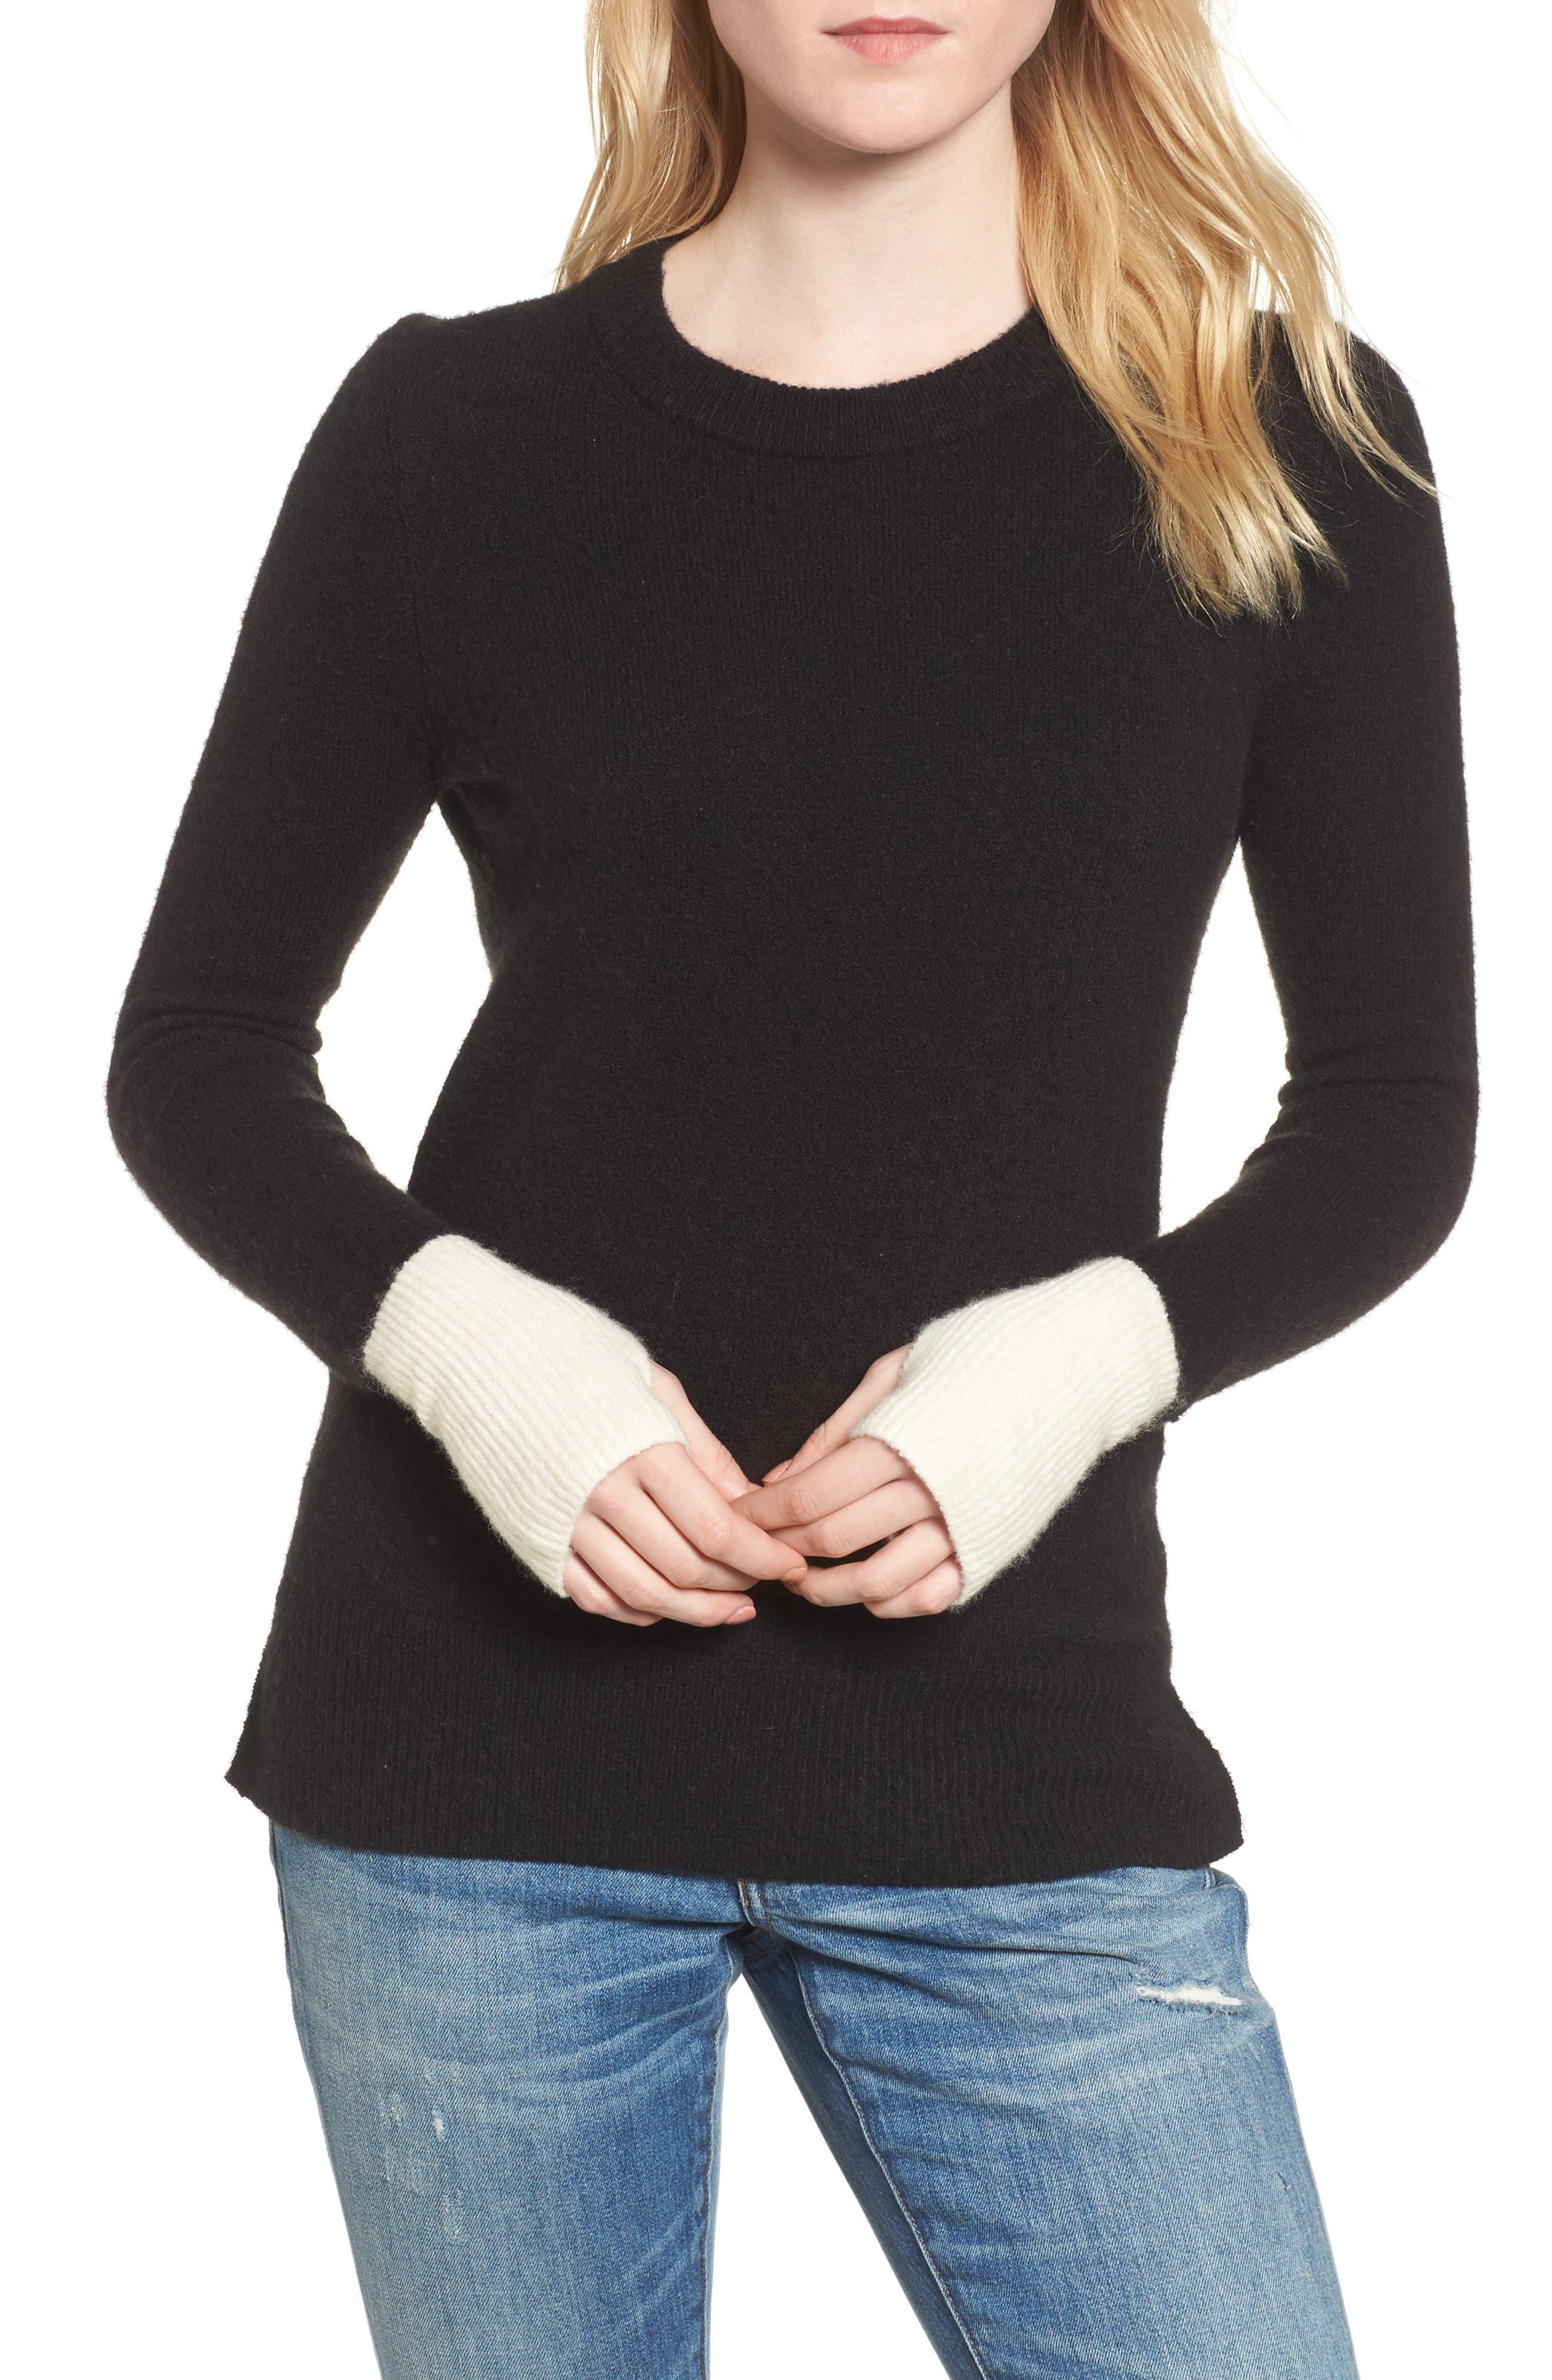 Fremont Colorblock Pullover Sweater,                             Main thumbnail 1, color,                             True Black